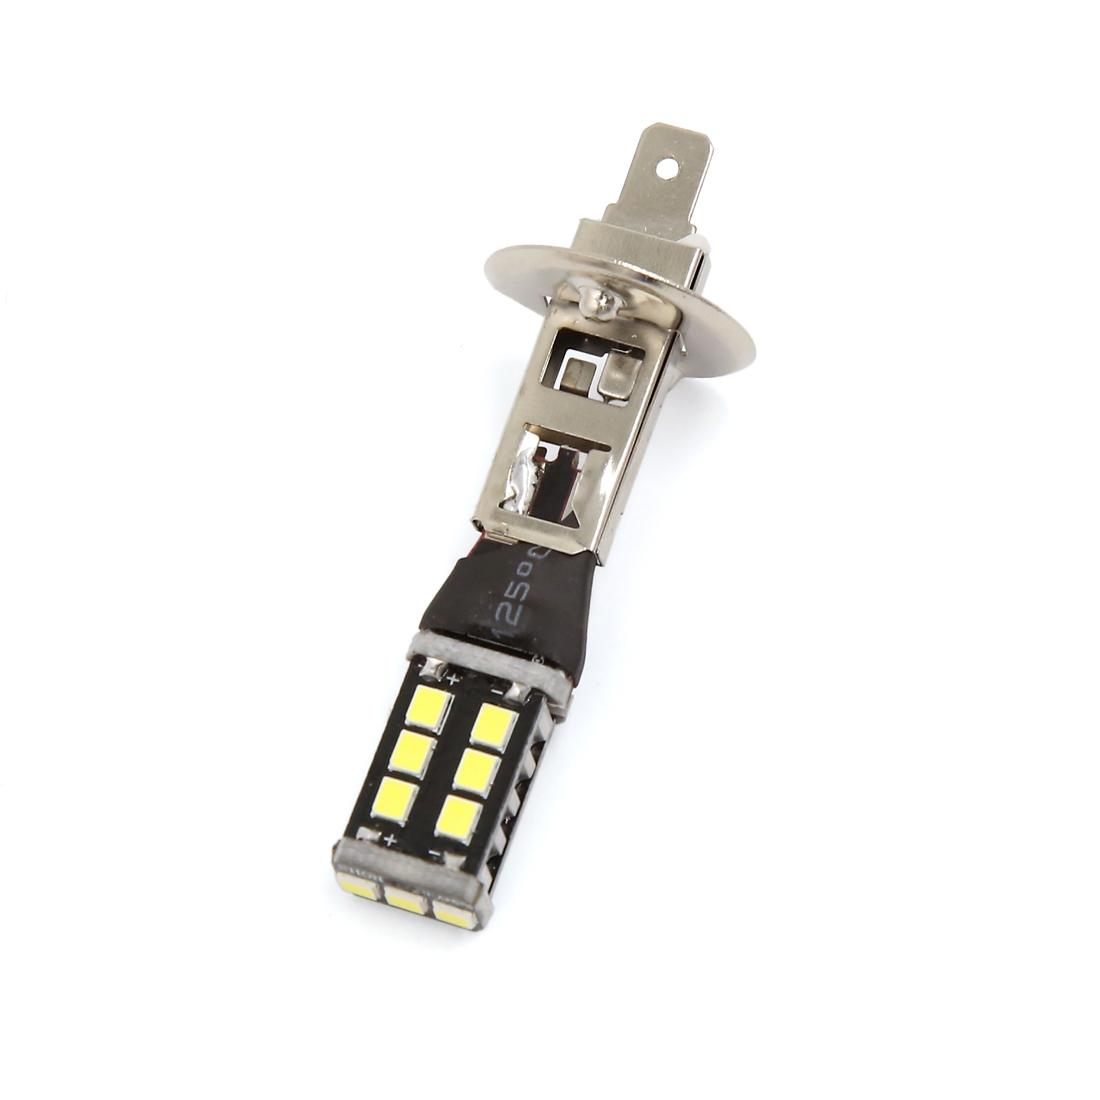 Car Vehicle 15W 2835 H1 800-1000LM 15 SMD White Daytime Running Light Lamp Bulb